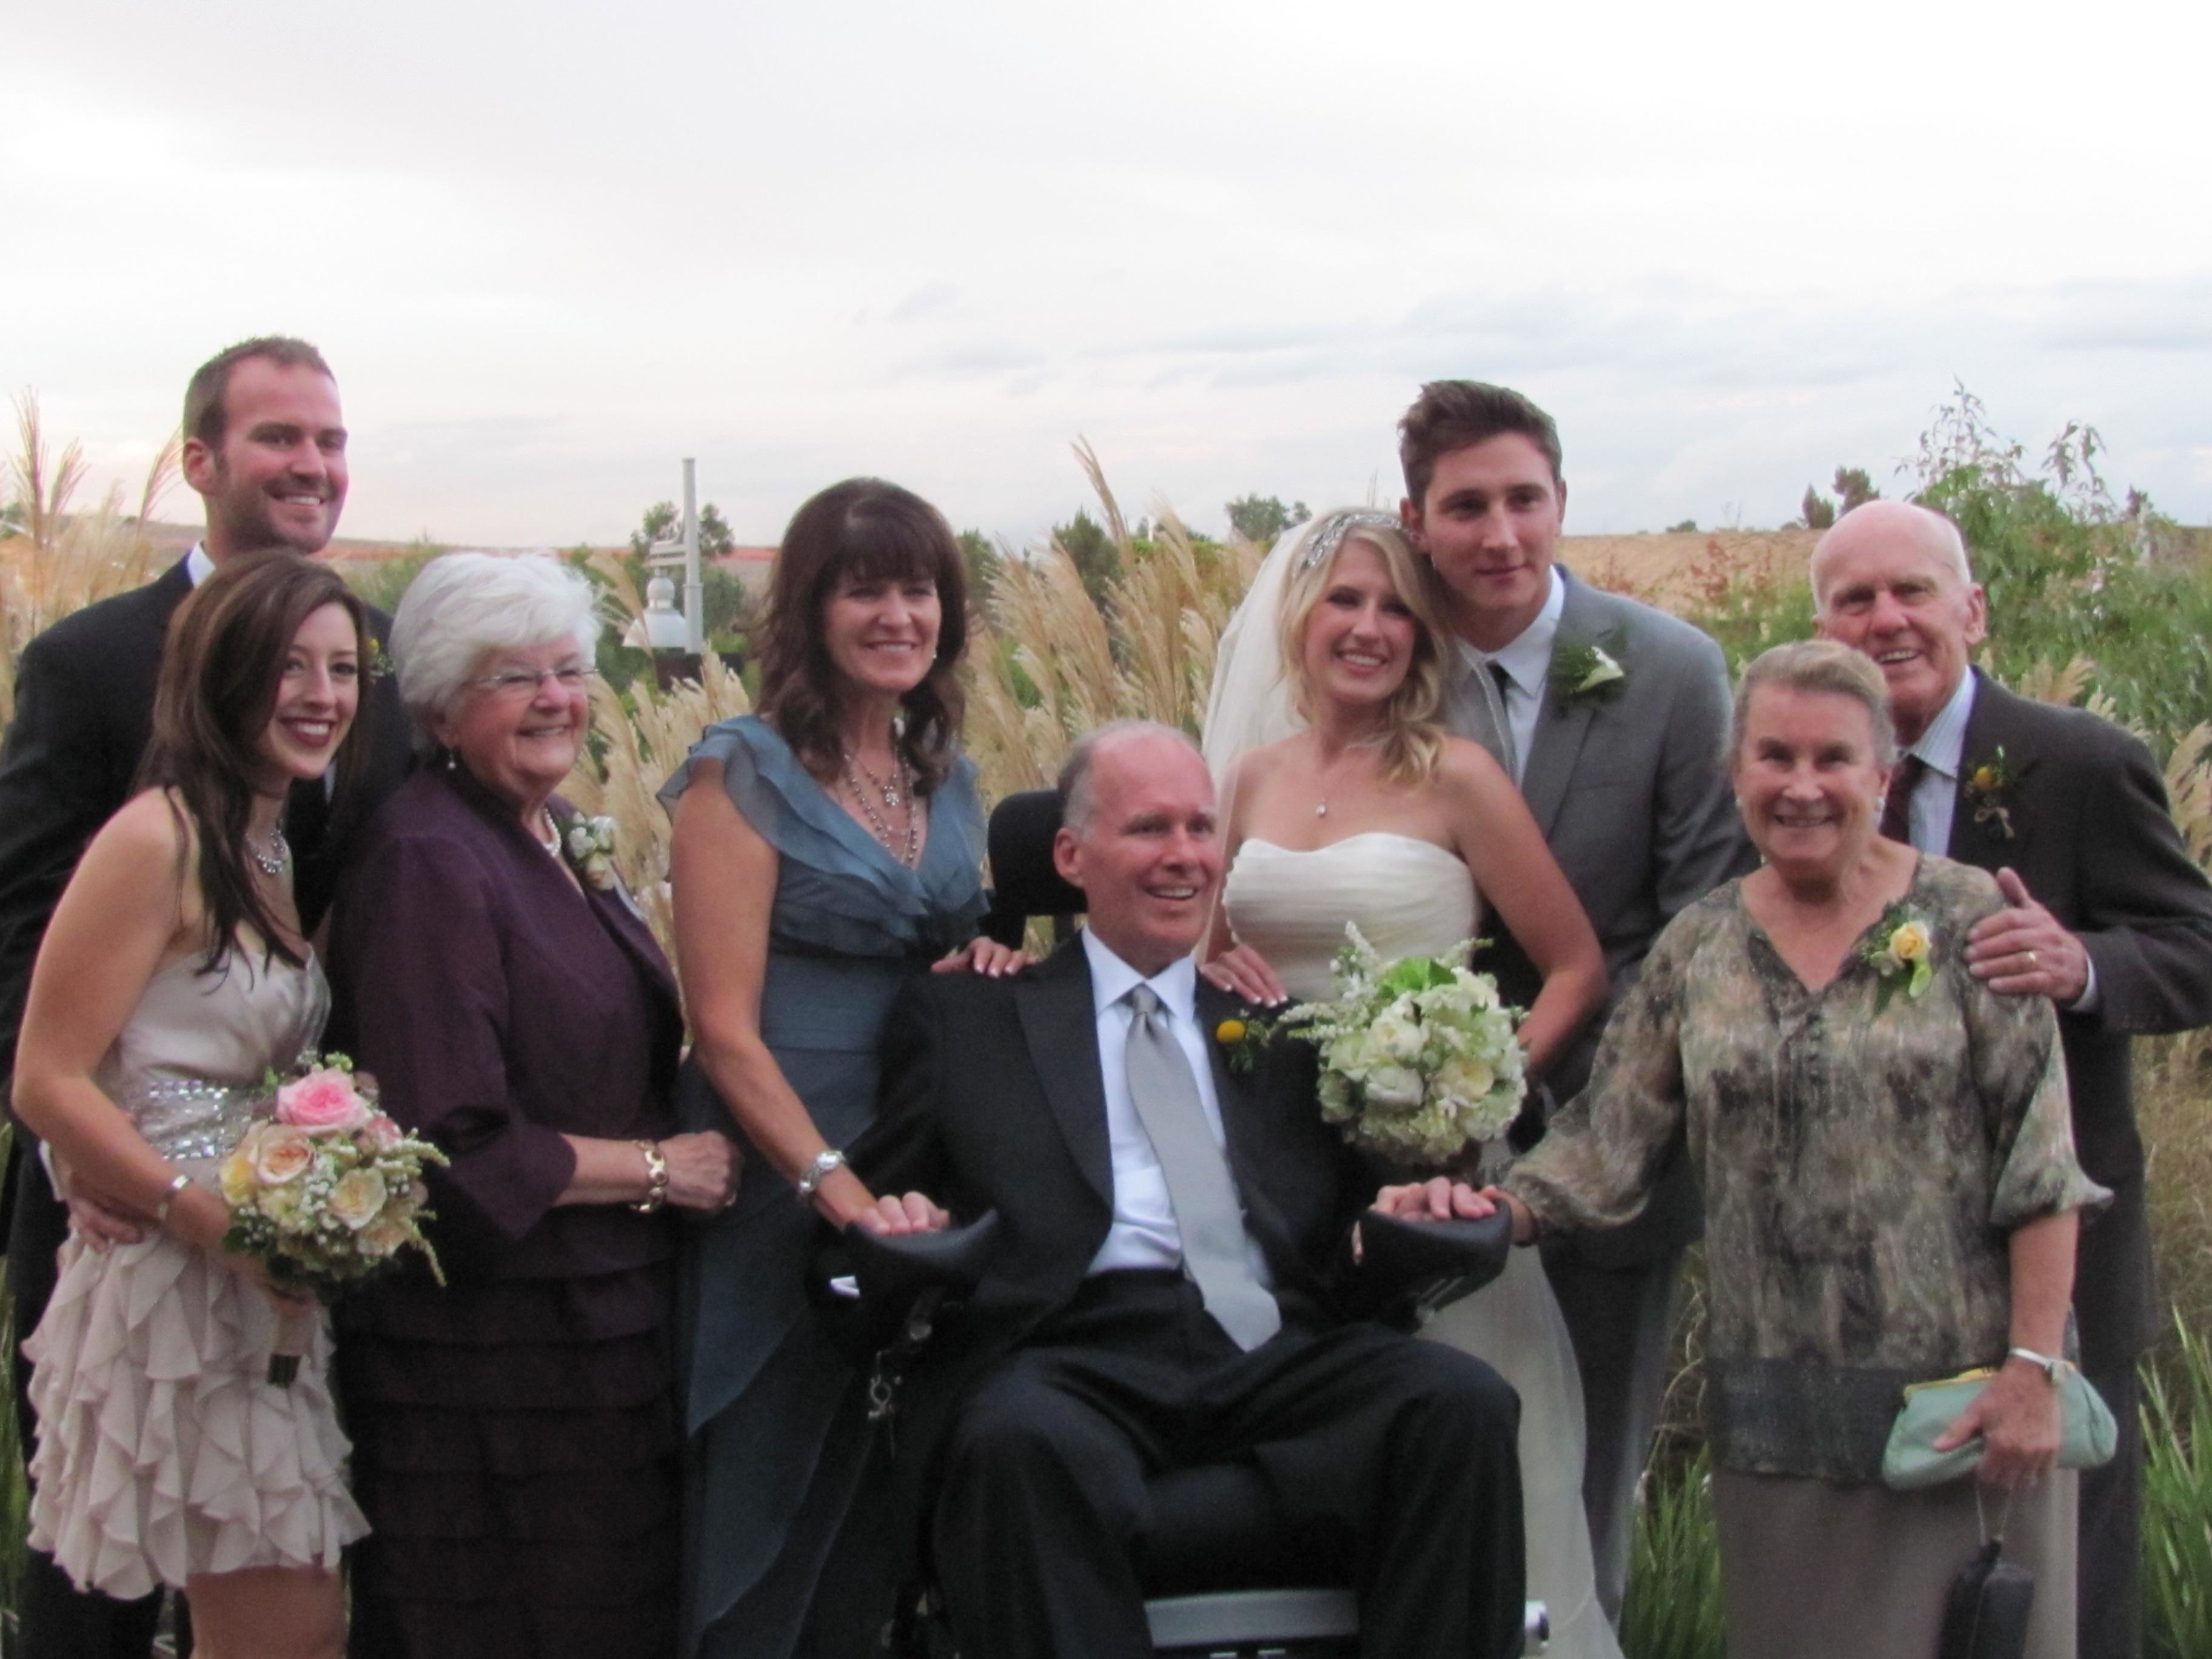 Chelsea's Wedding, The Devin Family